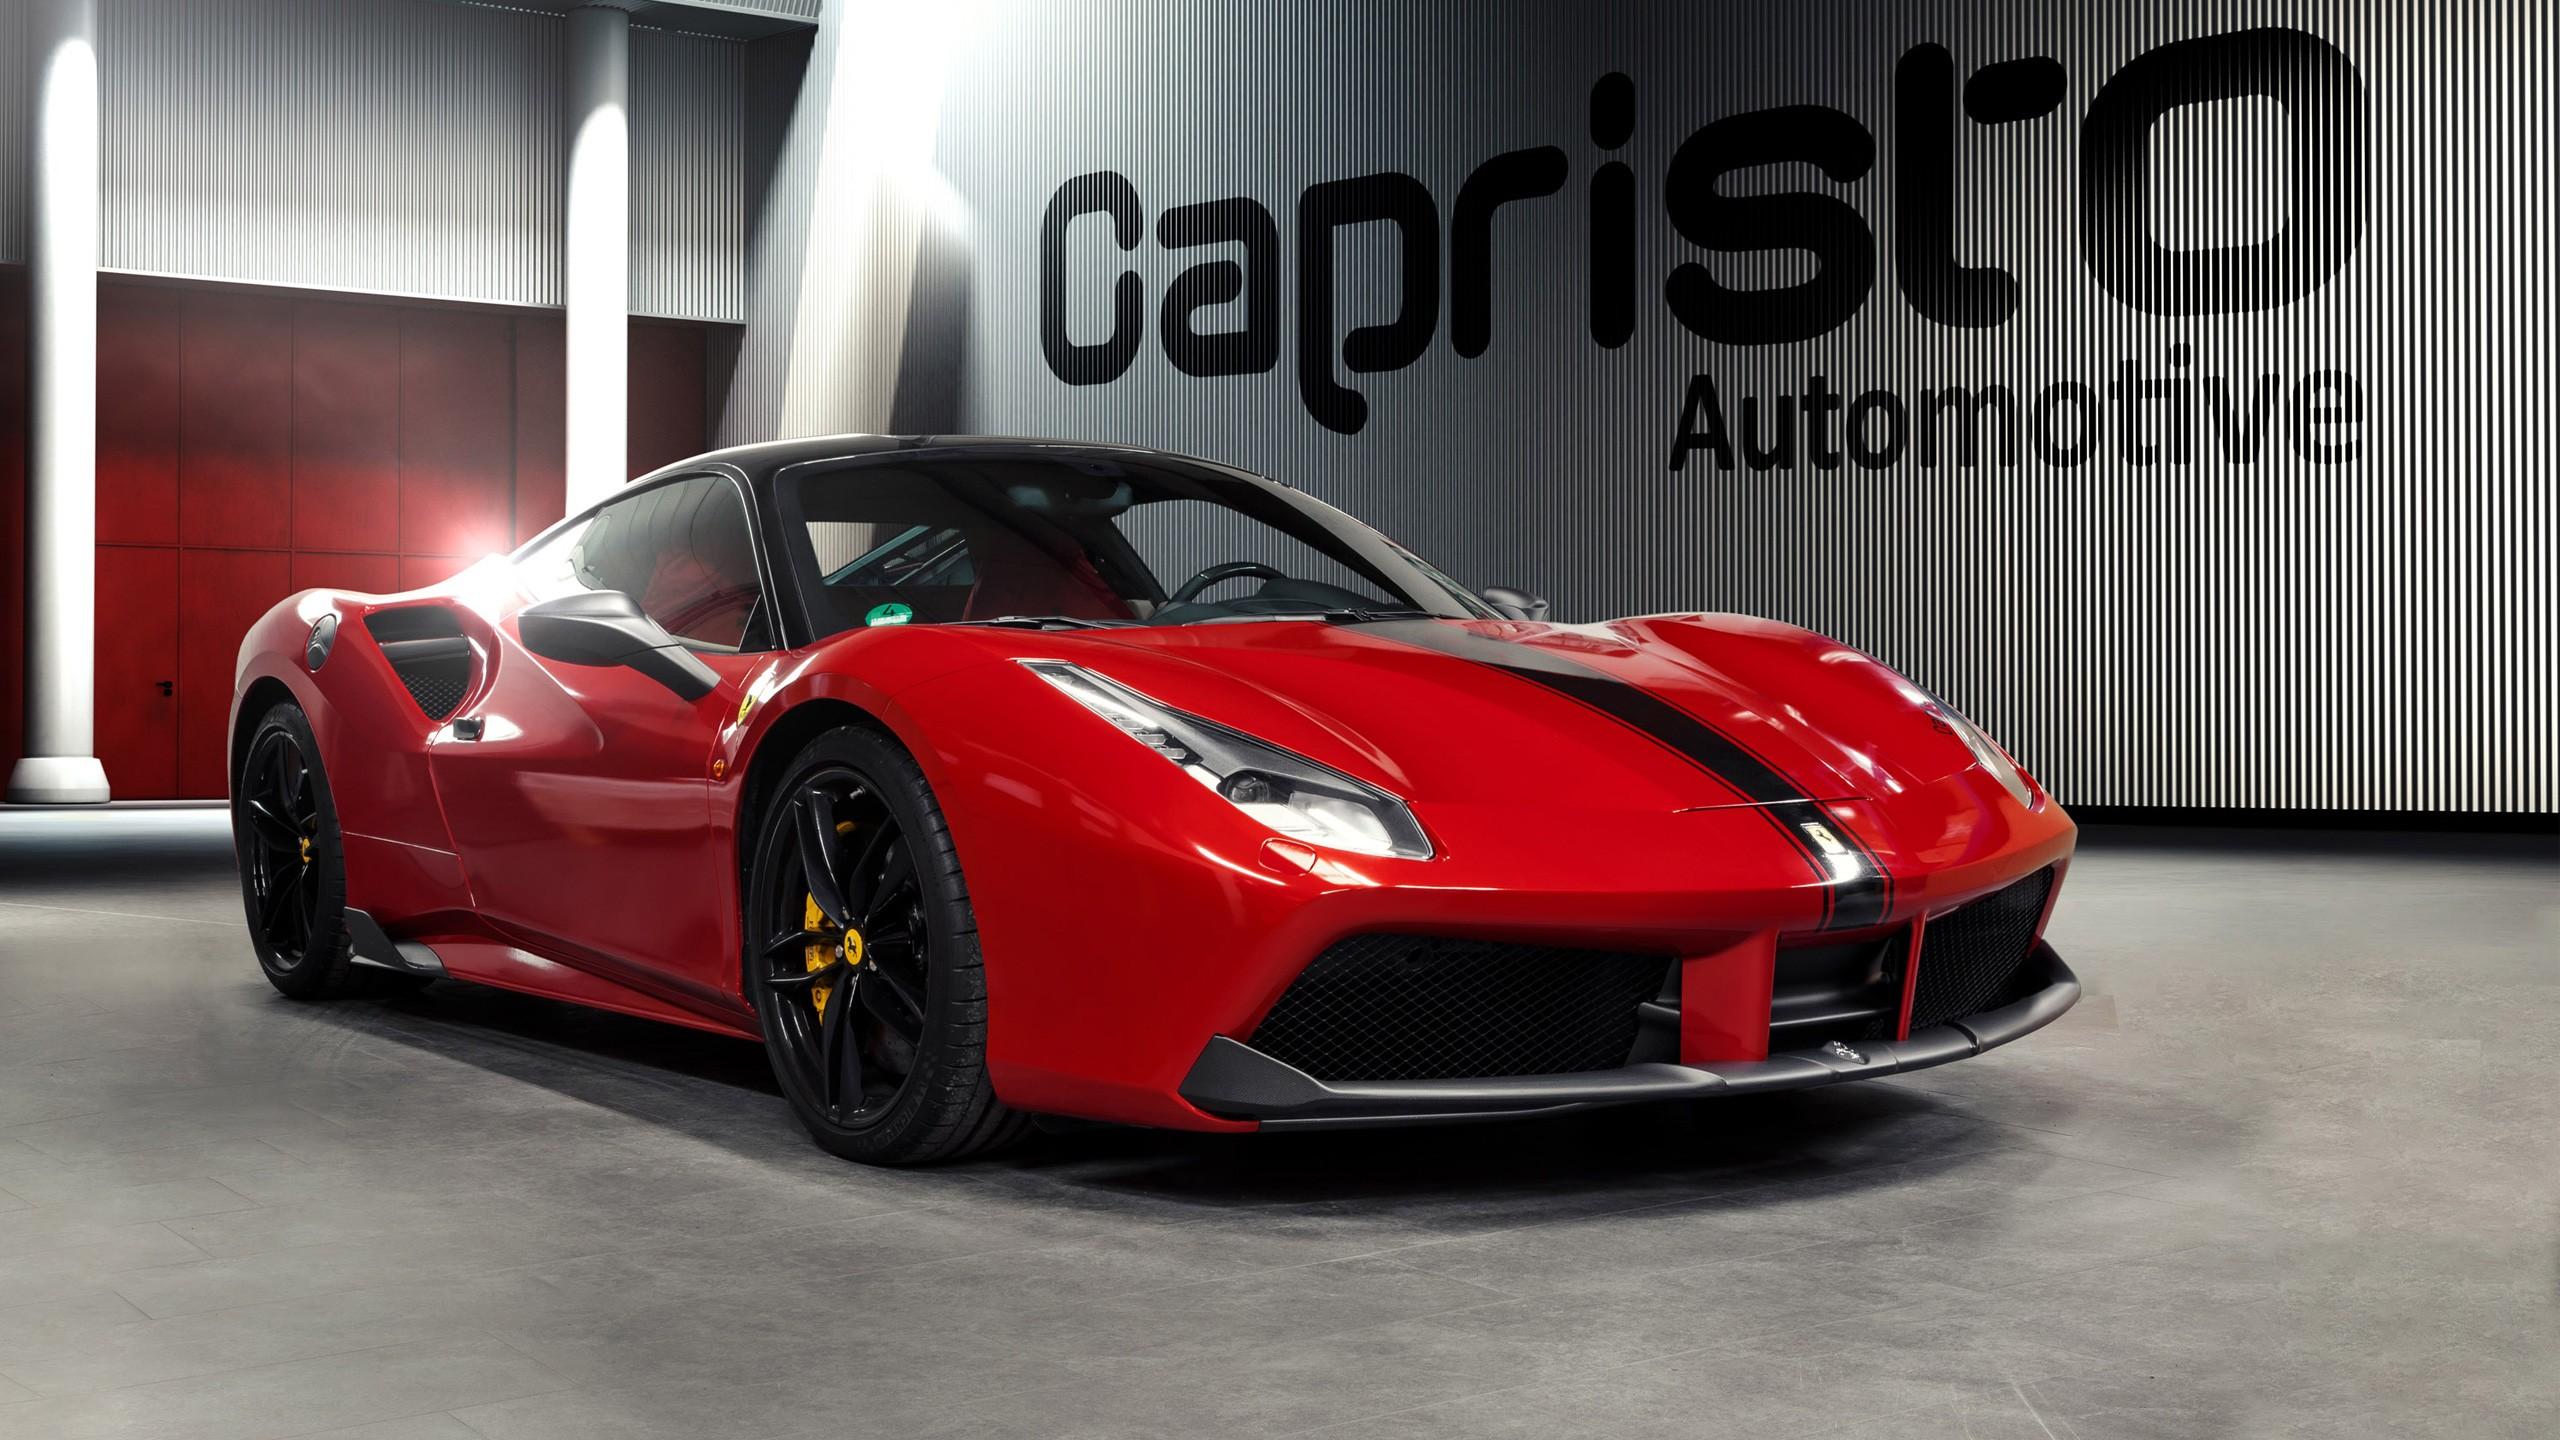 Black Ferrari 812 Superfast >> 2016 Capristo Automotive Ferrari 488 GTB Wallpaper | HD Car Wallpapers | ID #6422